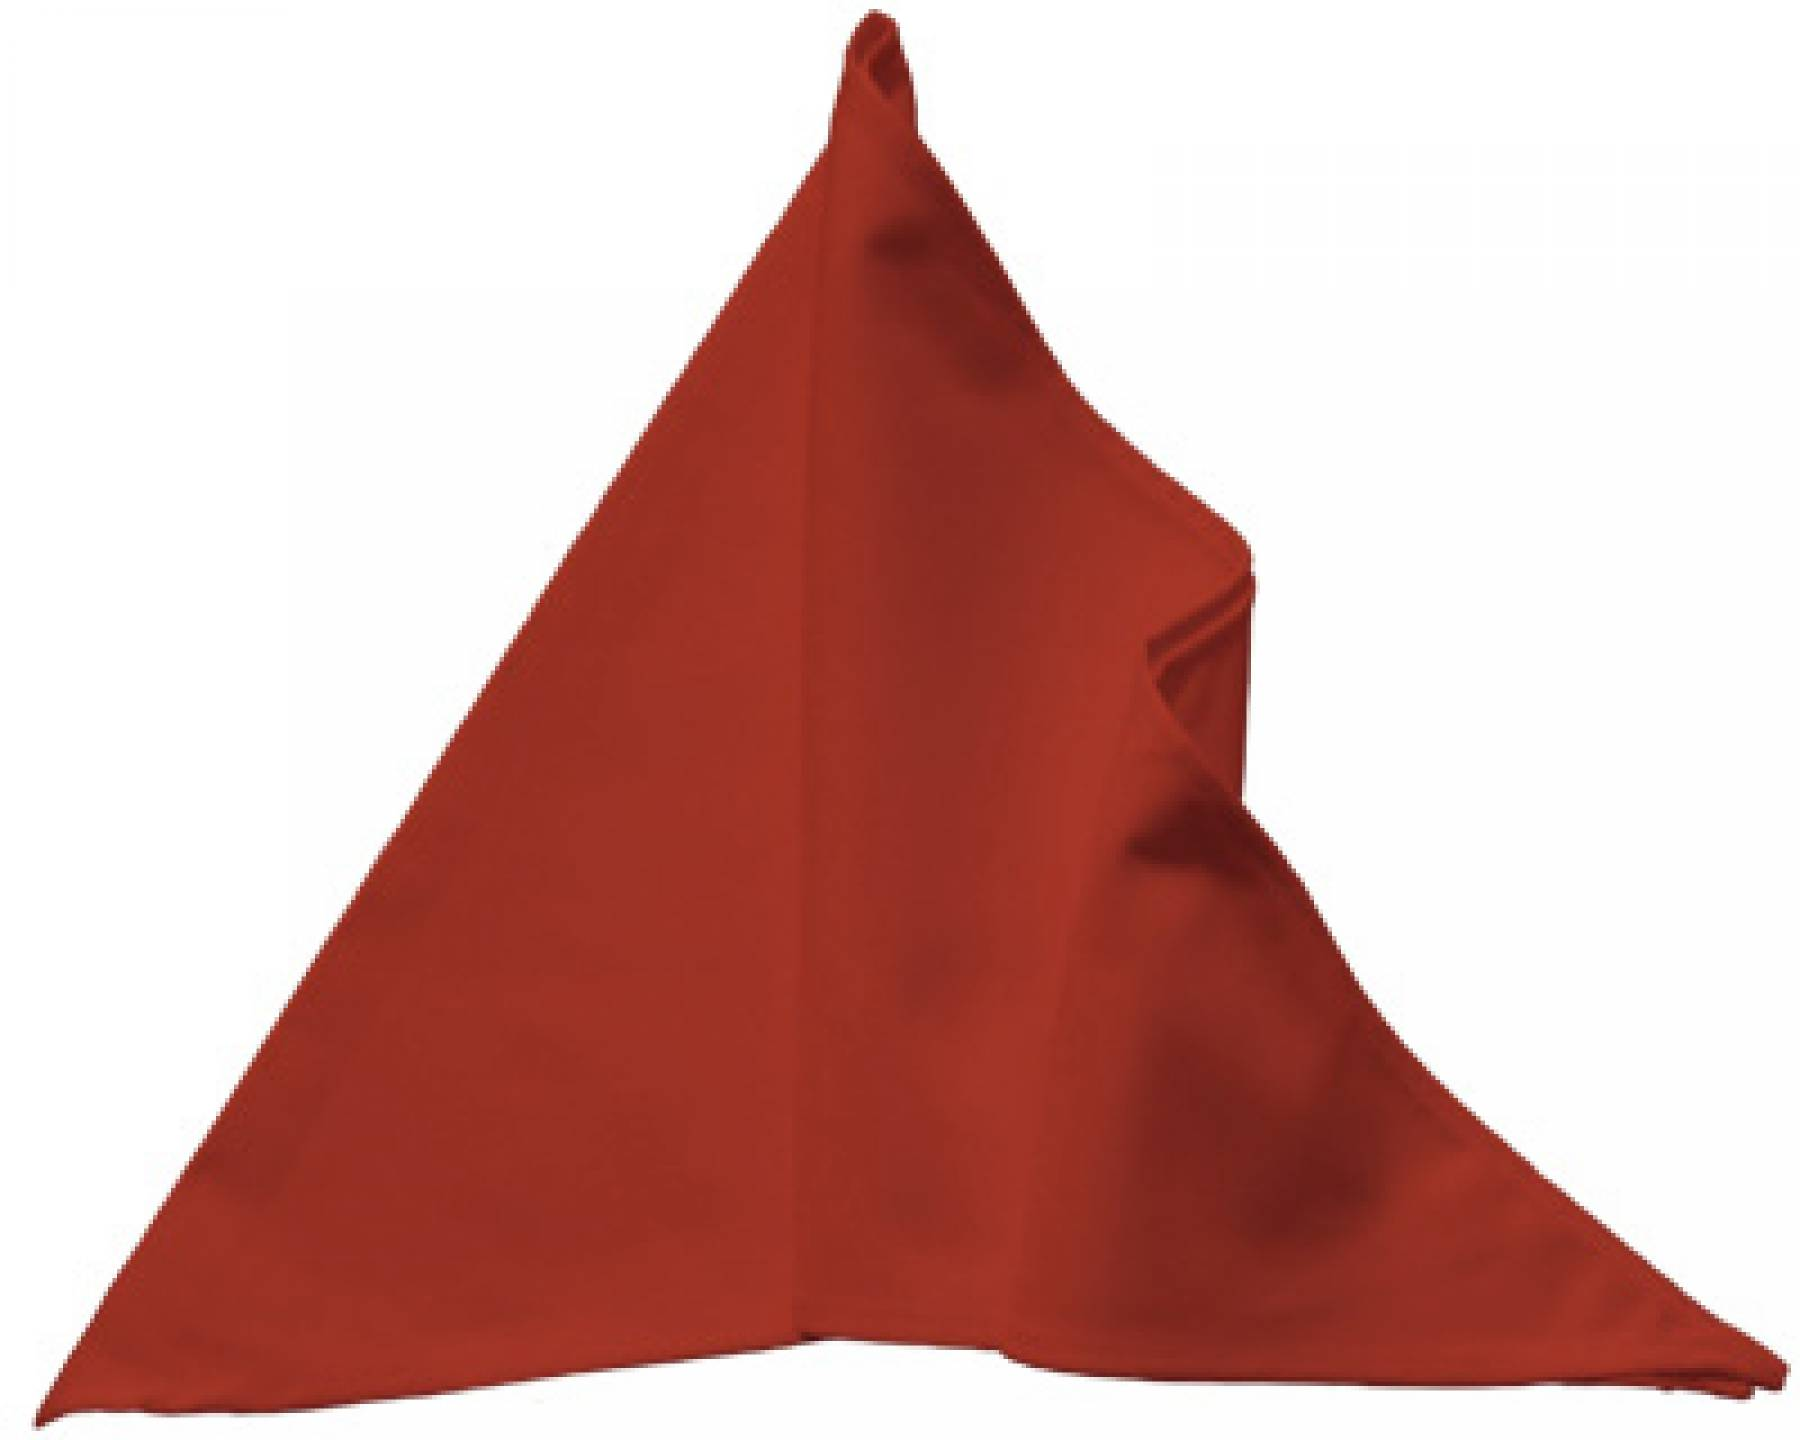 RED:Terracotta (ca. Pantone 4840)